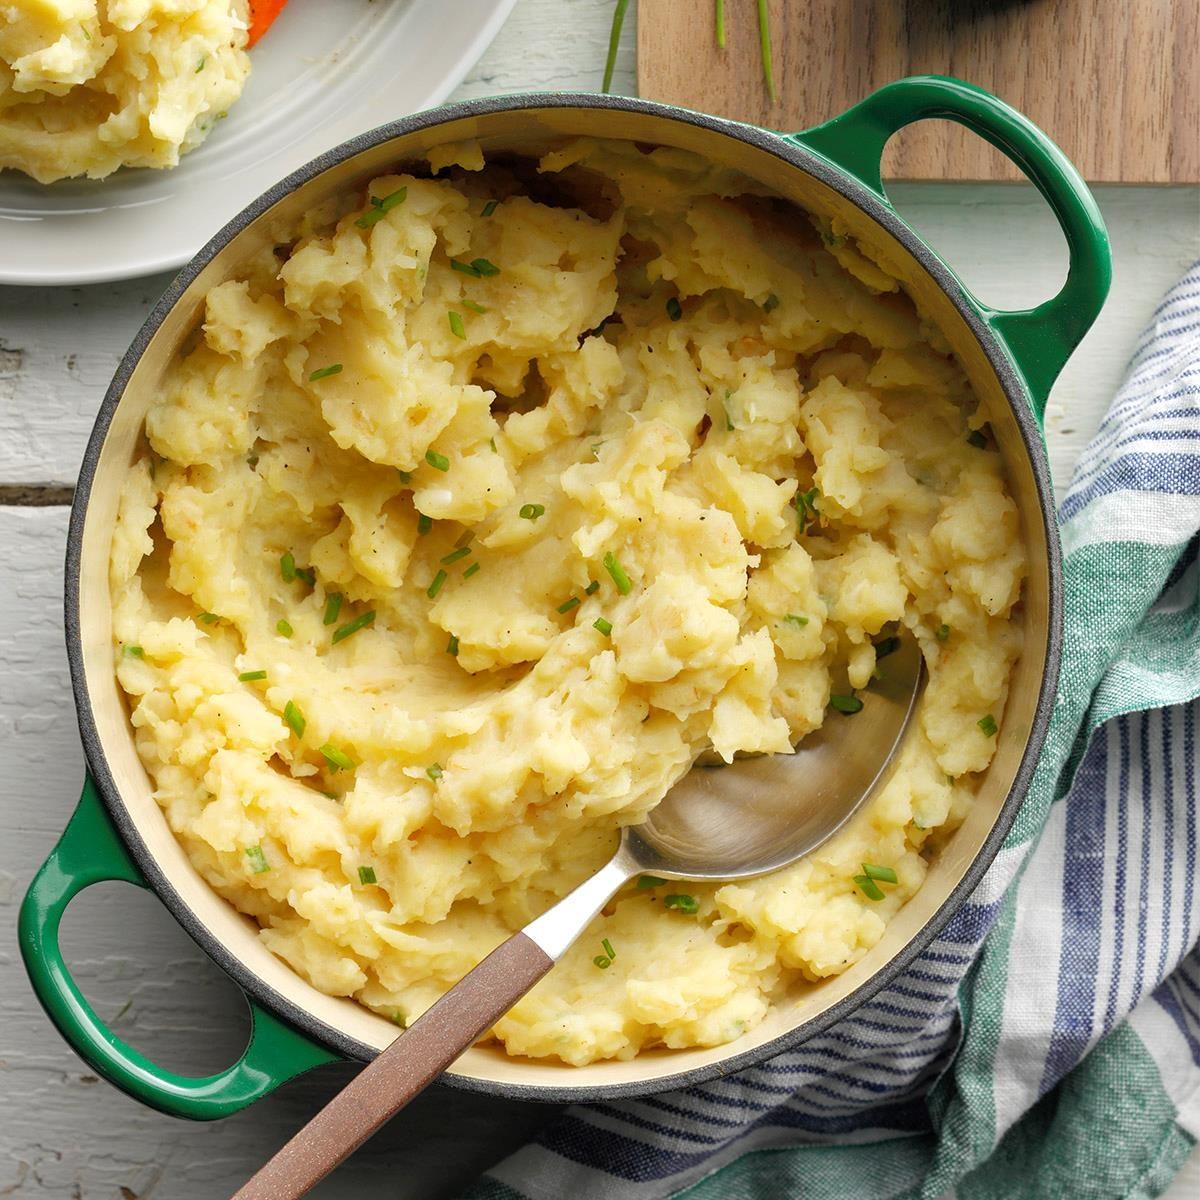 Celeriac & Garlic Mashed Potatoes